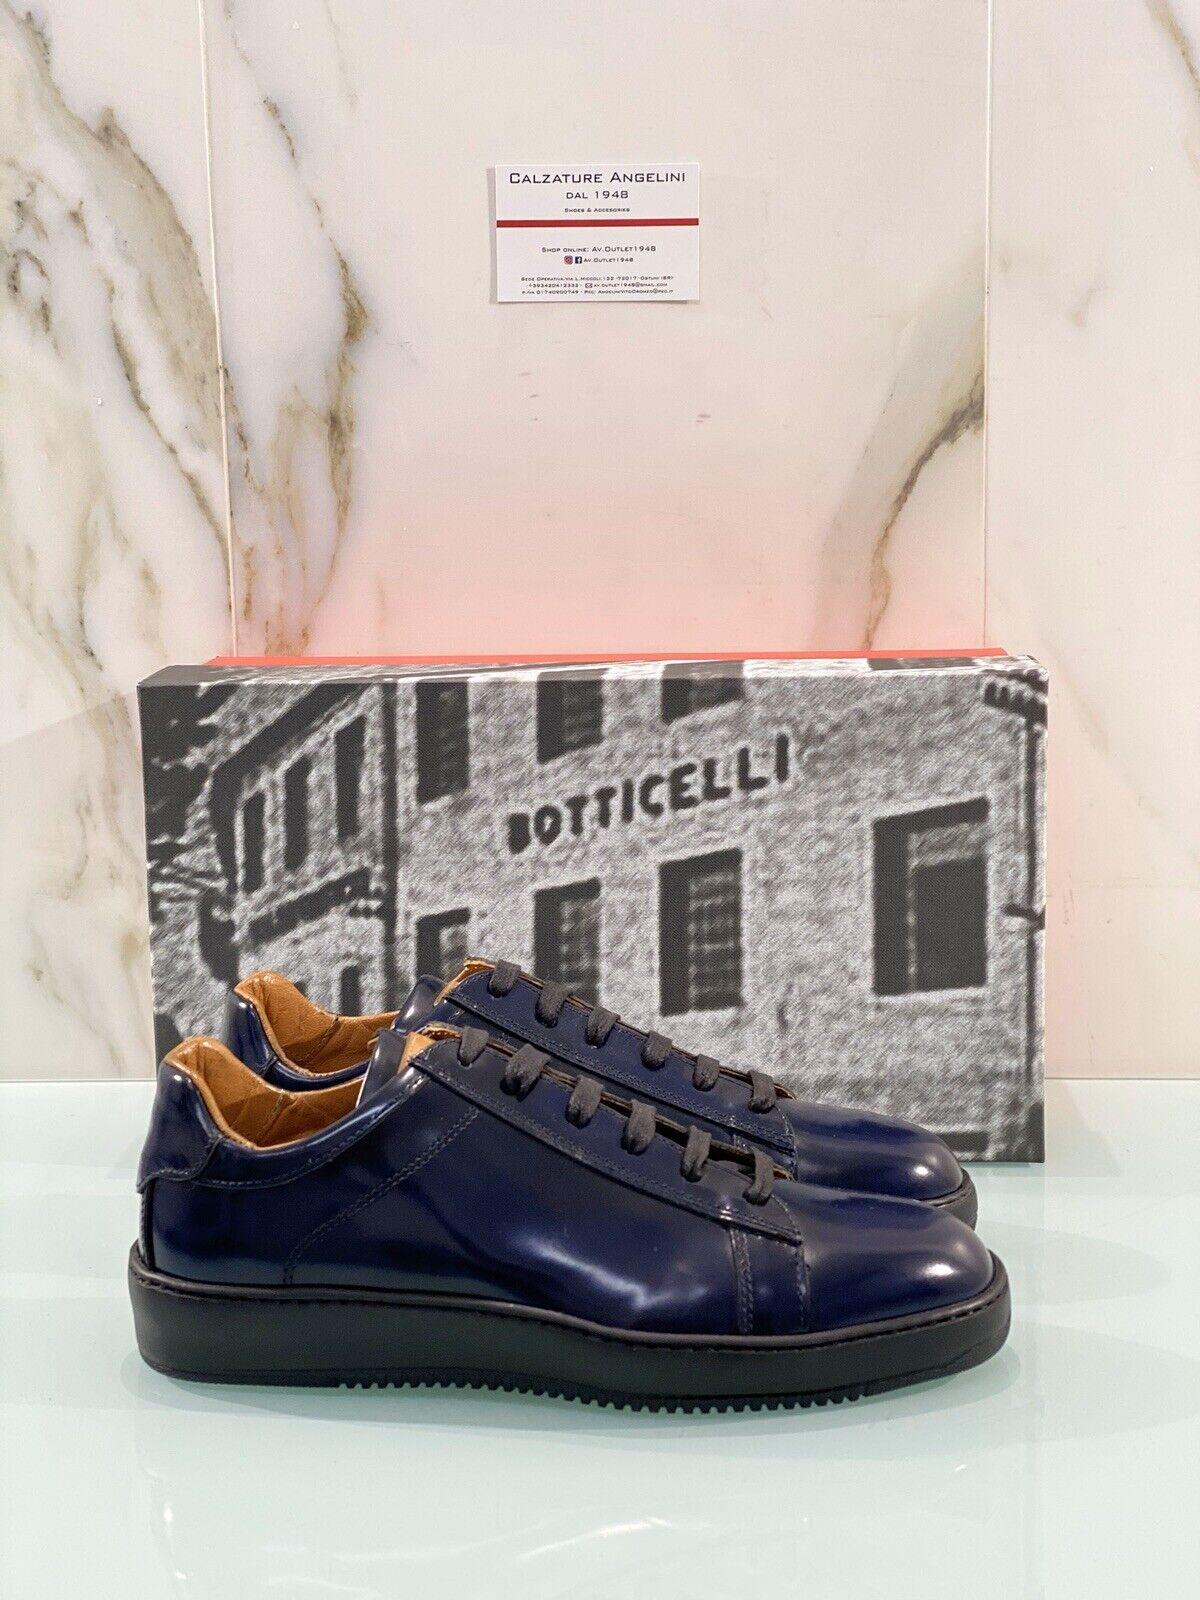 Roberto Botticelli Turnschuhe Mann 37204 in Leder Blau Polish Luxury Mann Schuh 44